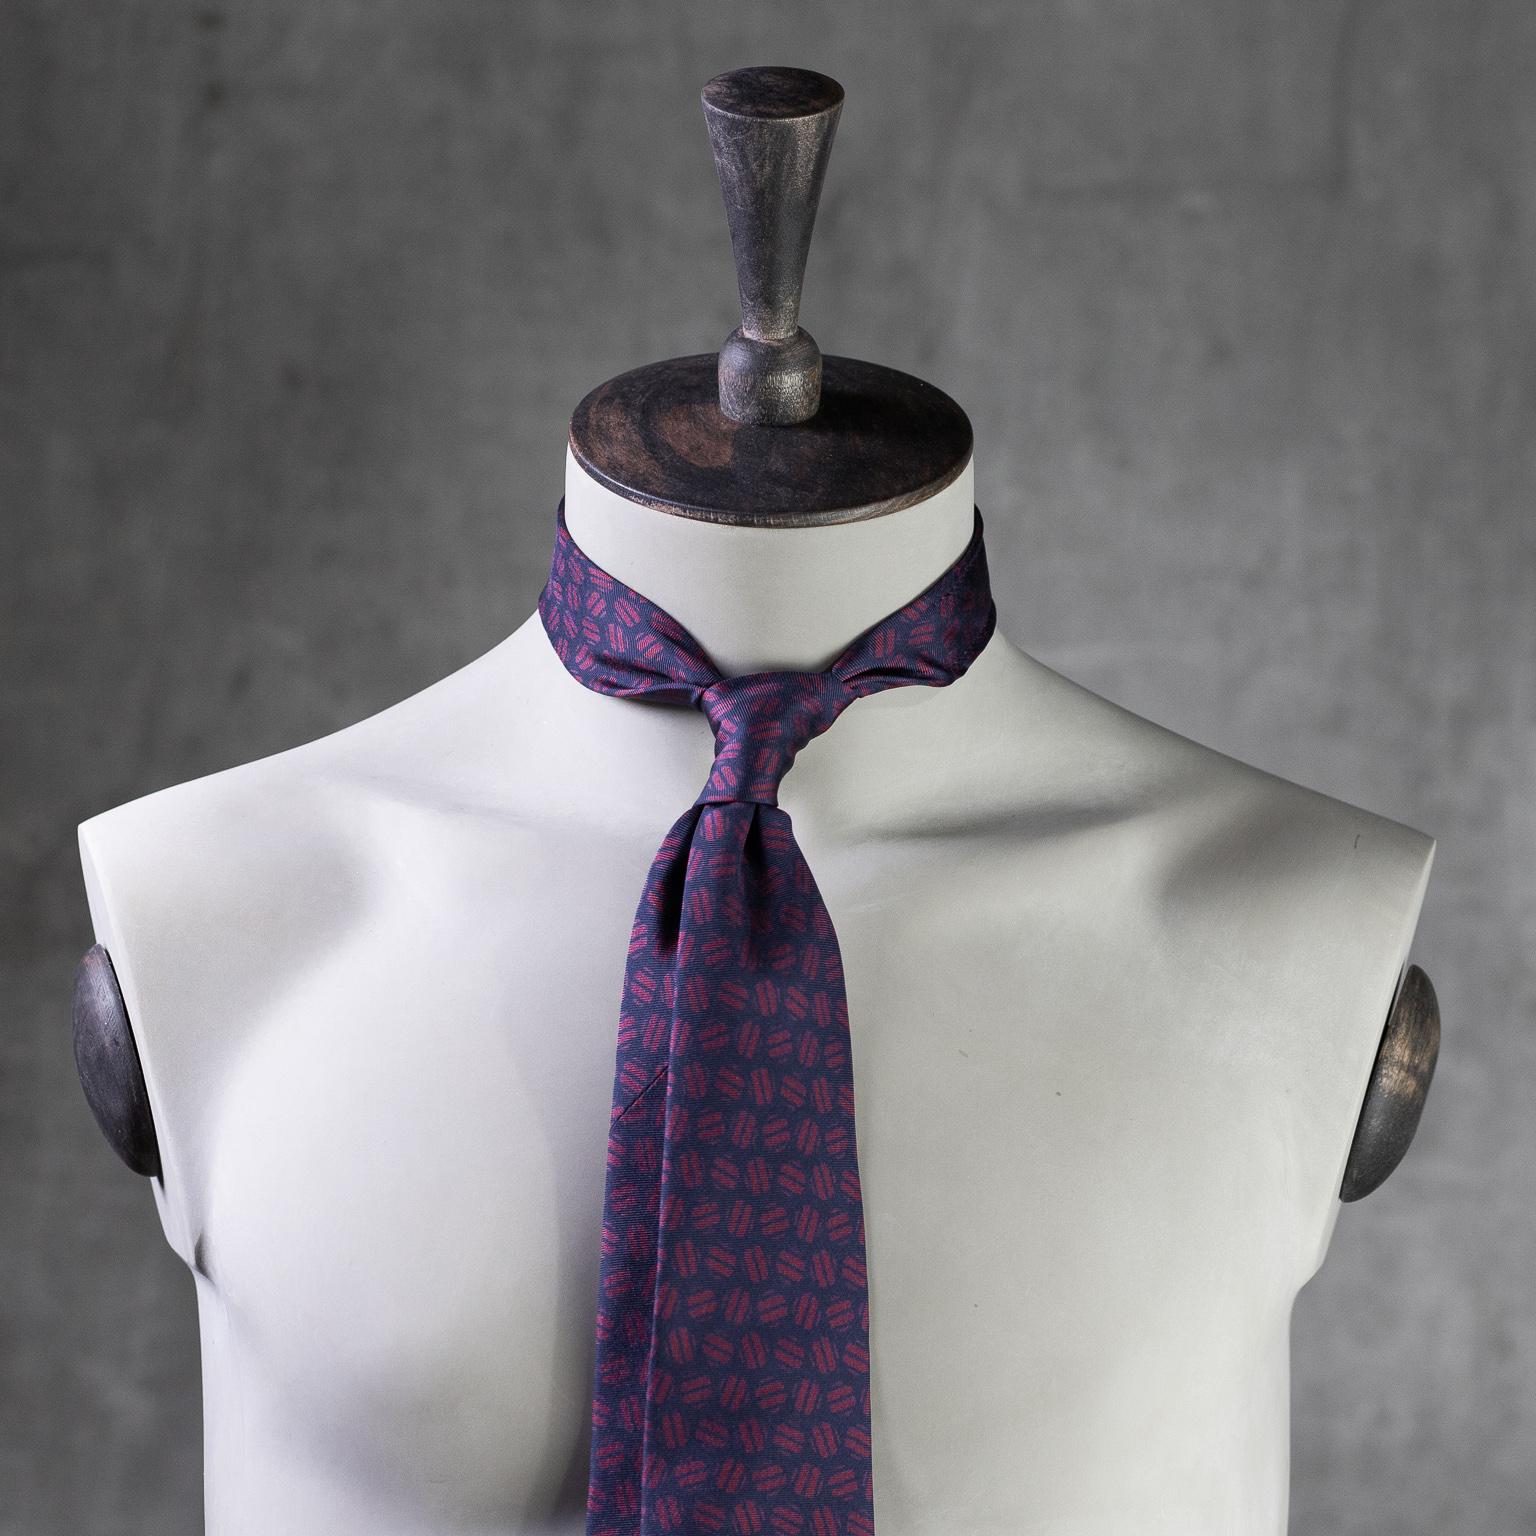 PRINTED-SILK-SEDA-ESTAMPADA-0577-Tie-Initials-Corbata-Iniciales-The-Seelk-2